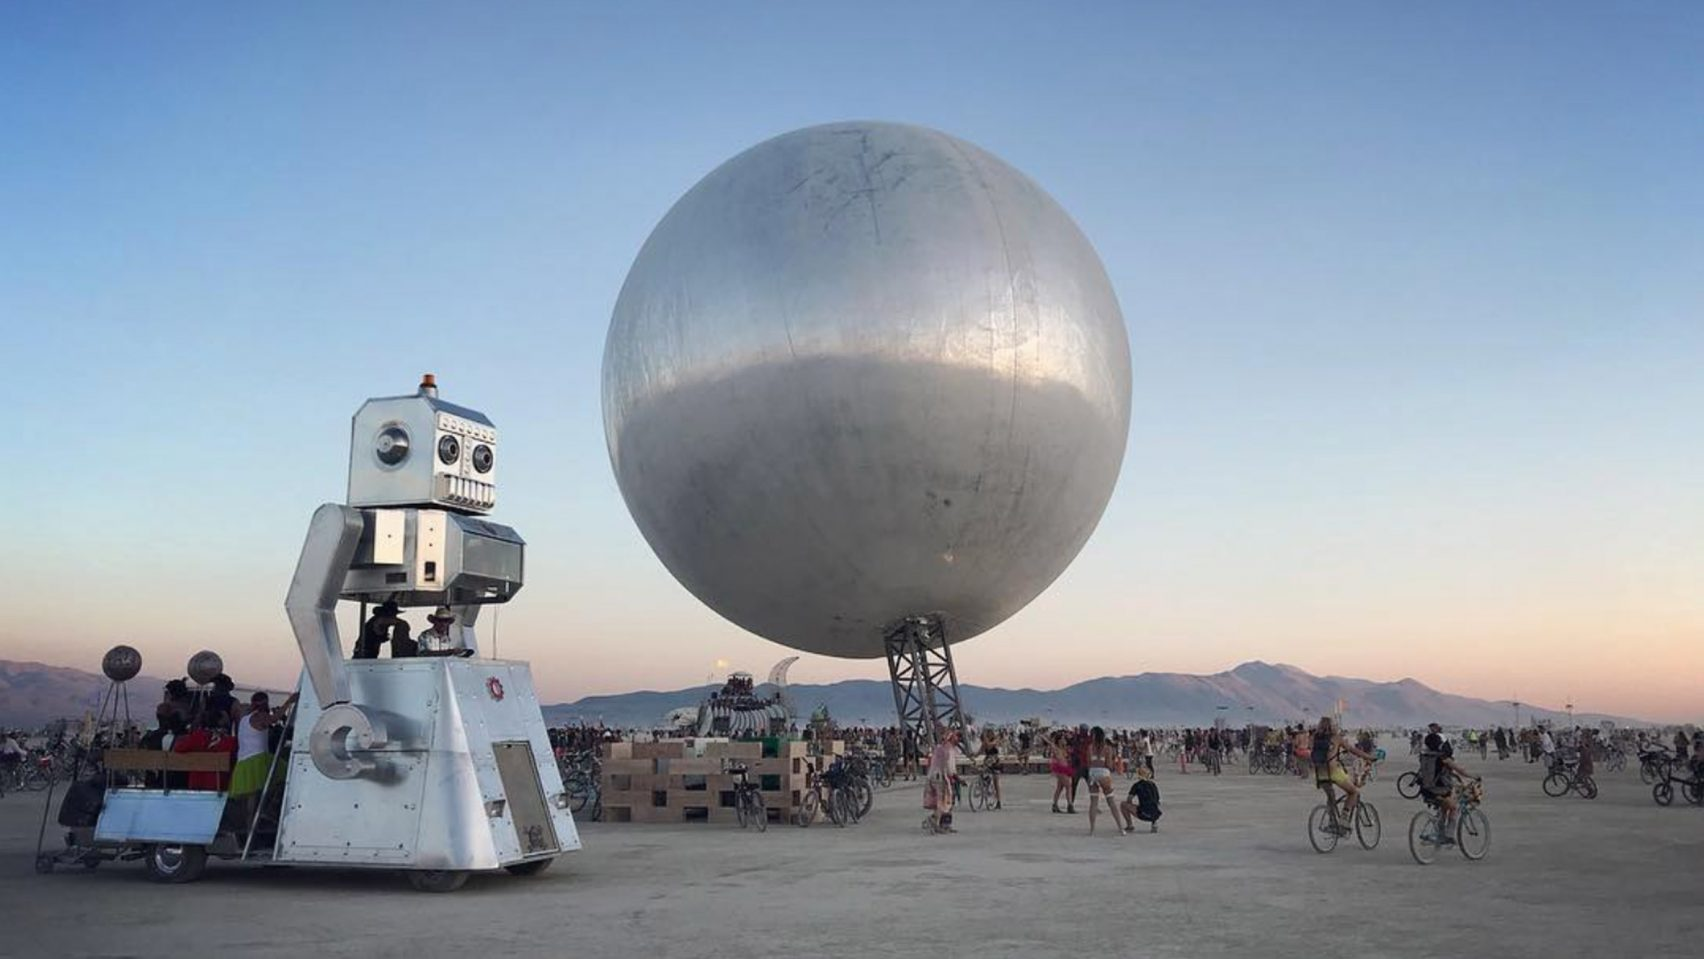 the orb bjarke ingles jakob lange burning man 2018 highlights dezeen hero a 1704x959 - Pari réussi pour BIG son ORB géant prend forme au festival Burning Man